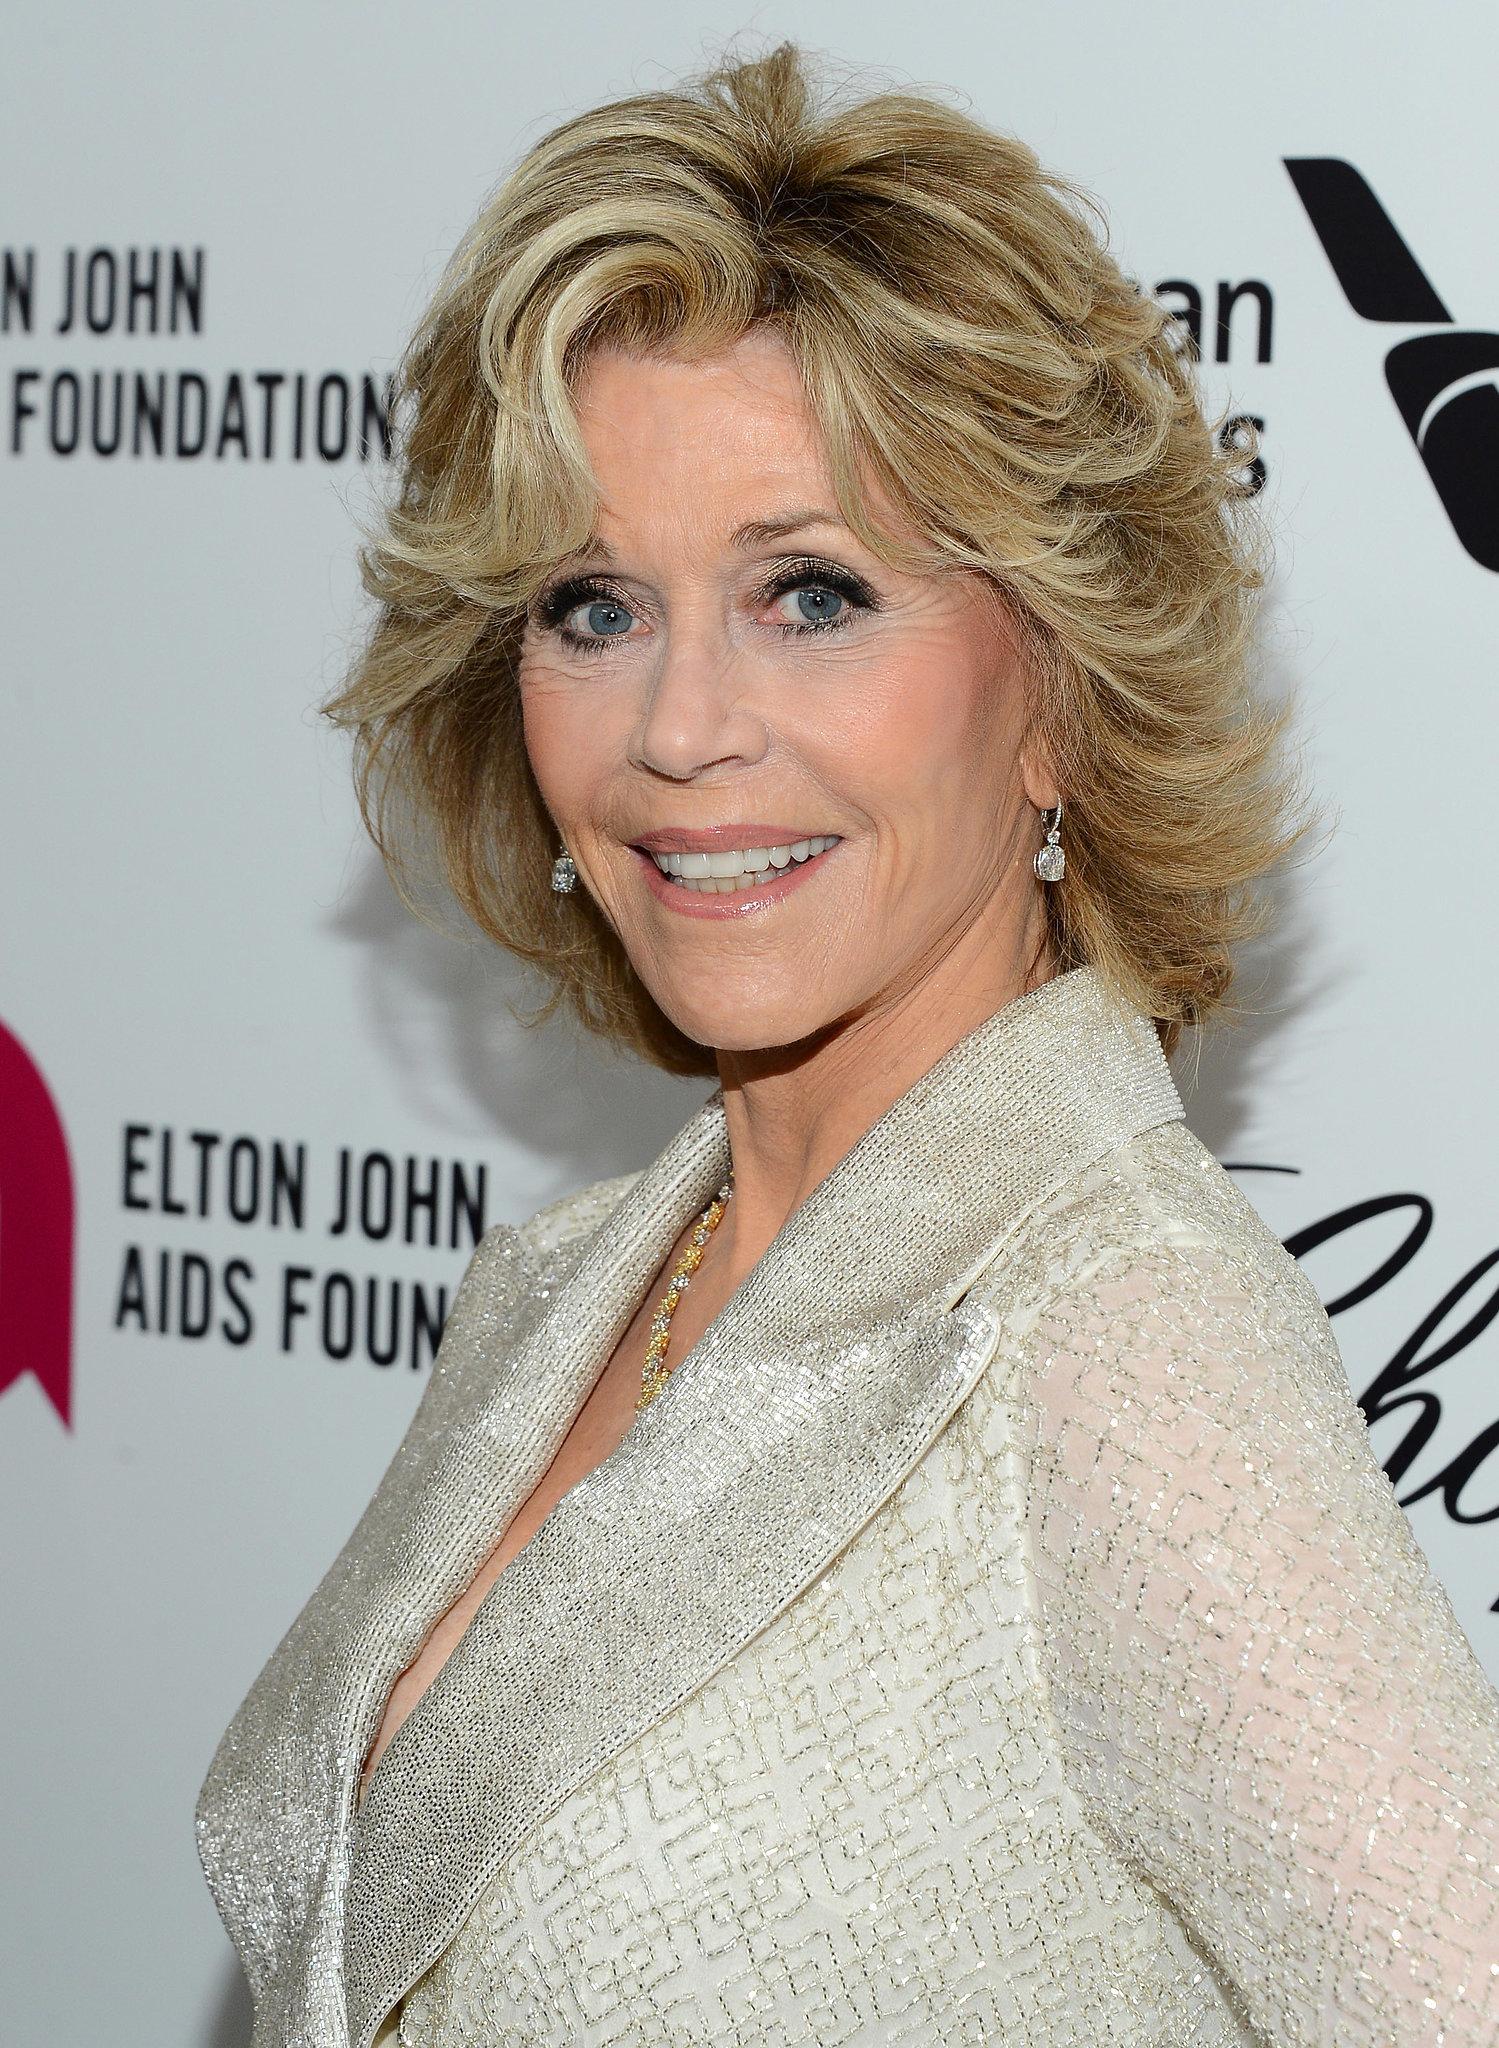 Jane Fonda at Elton John Party